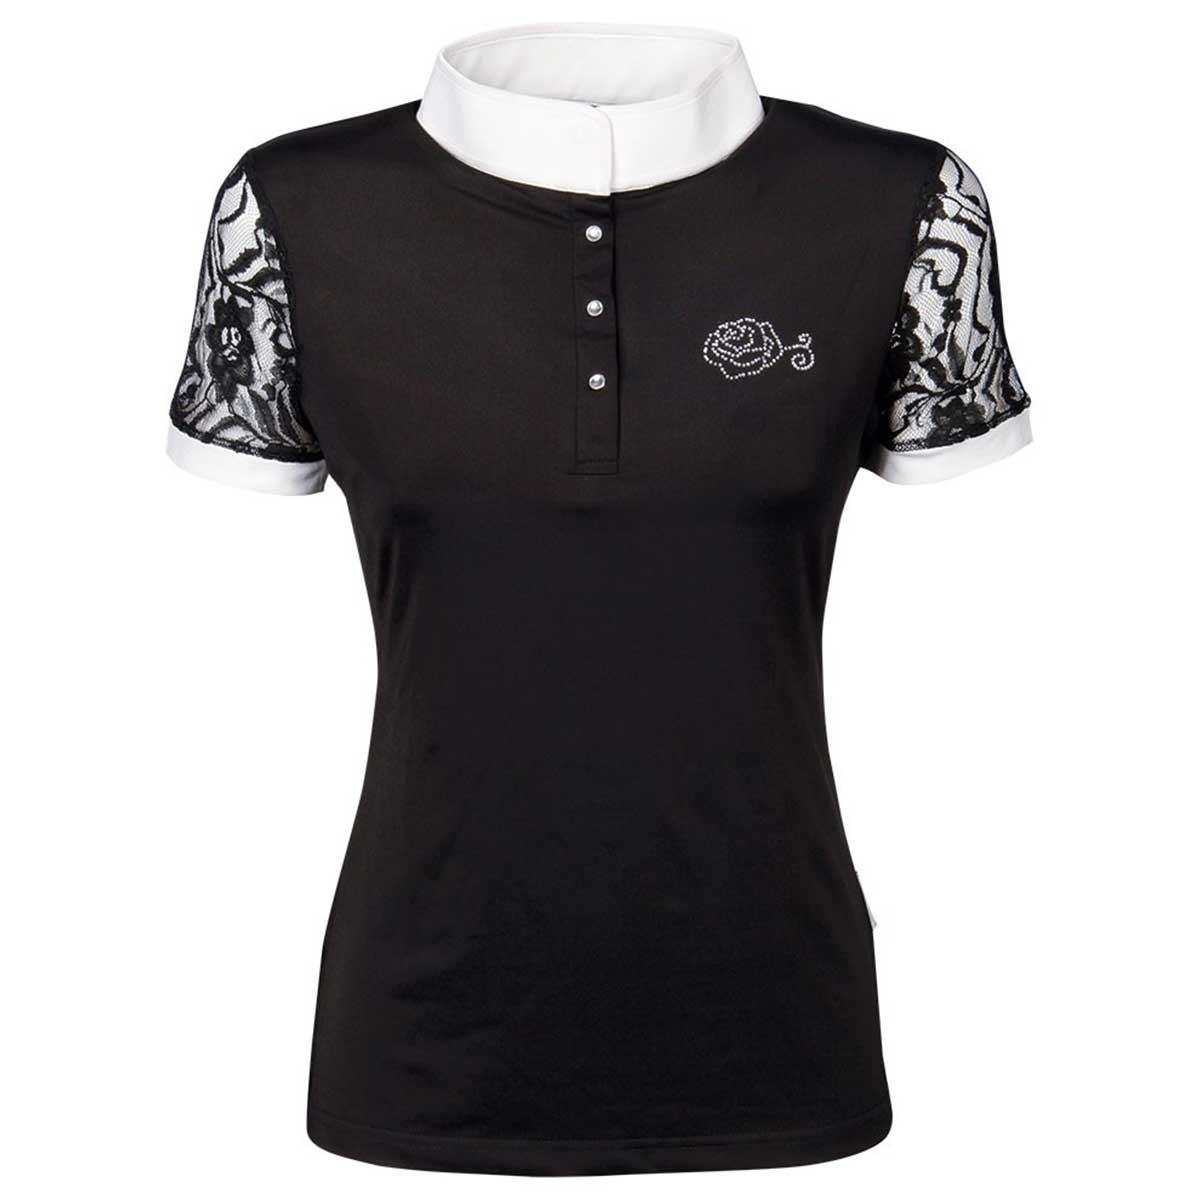 Harrys Horse Lace wedstrijdshirt zwart maat:l